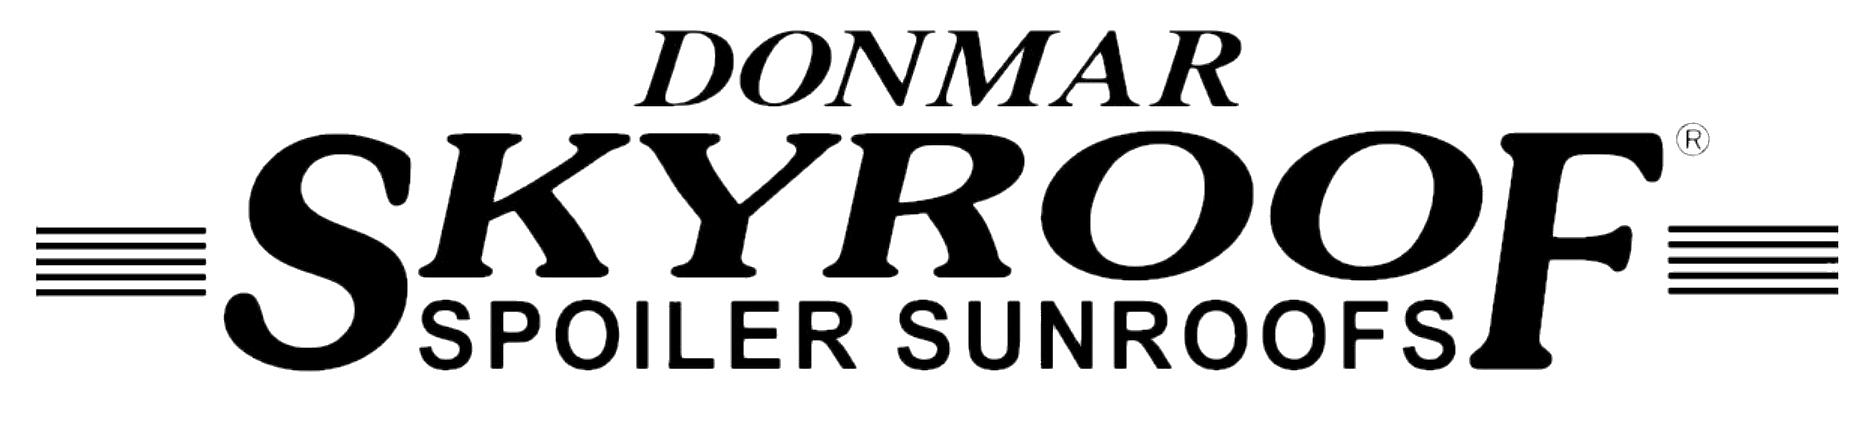 DONMAR Skyroof Spoiler Sunroofs